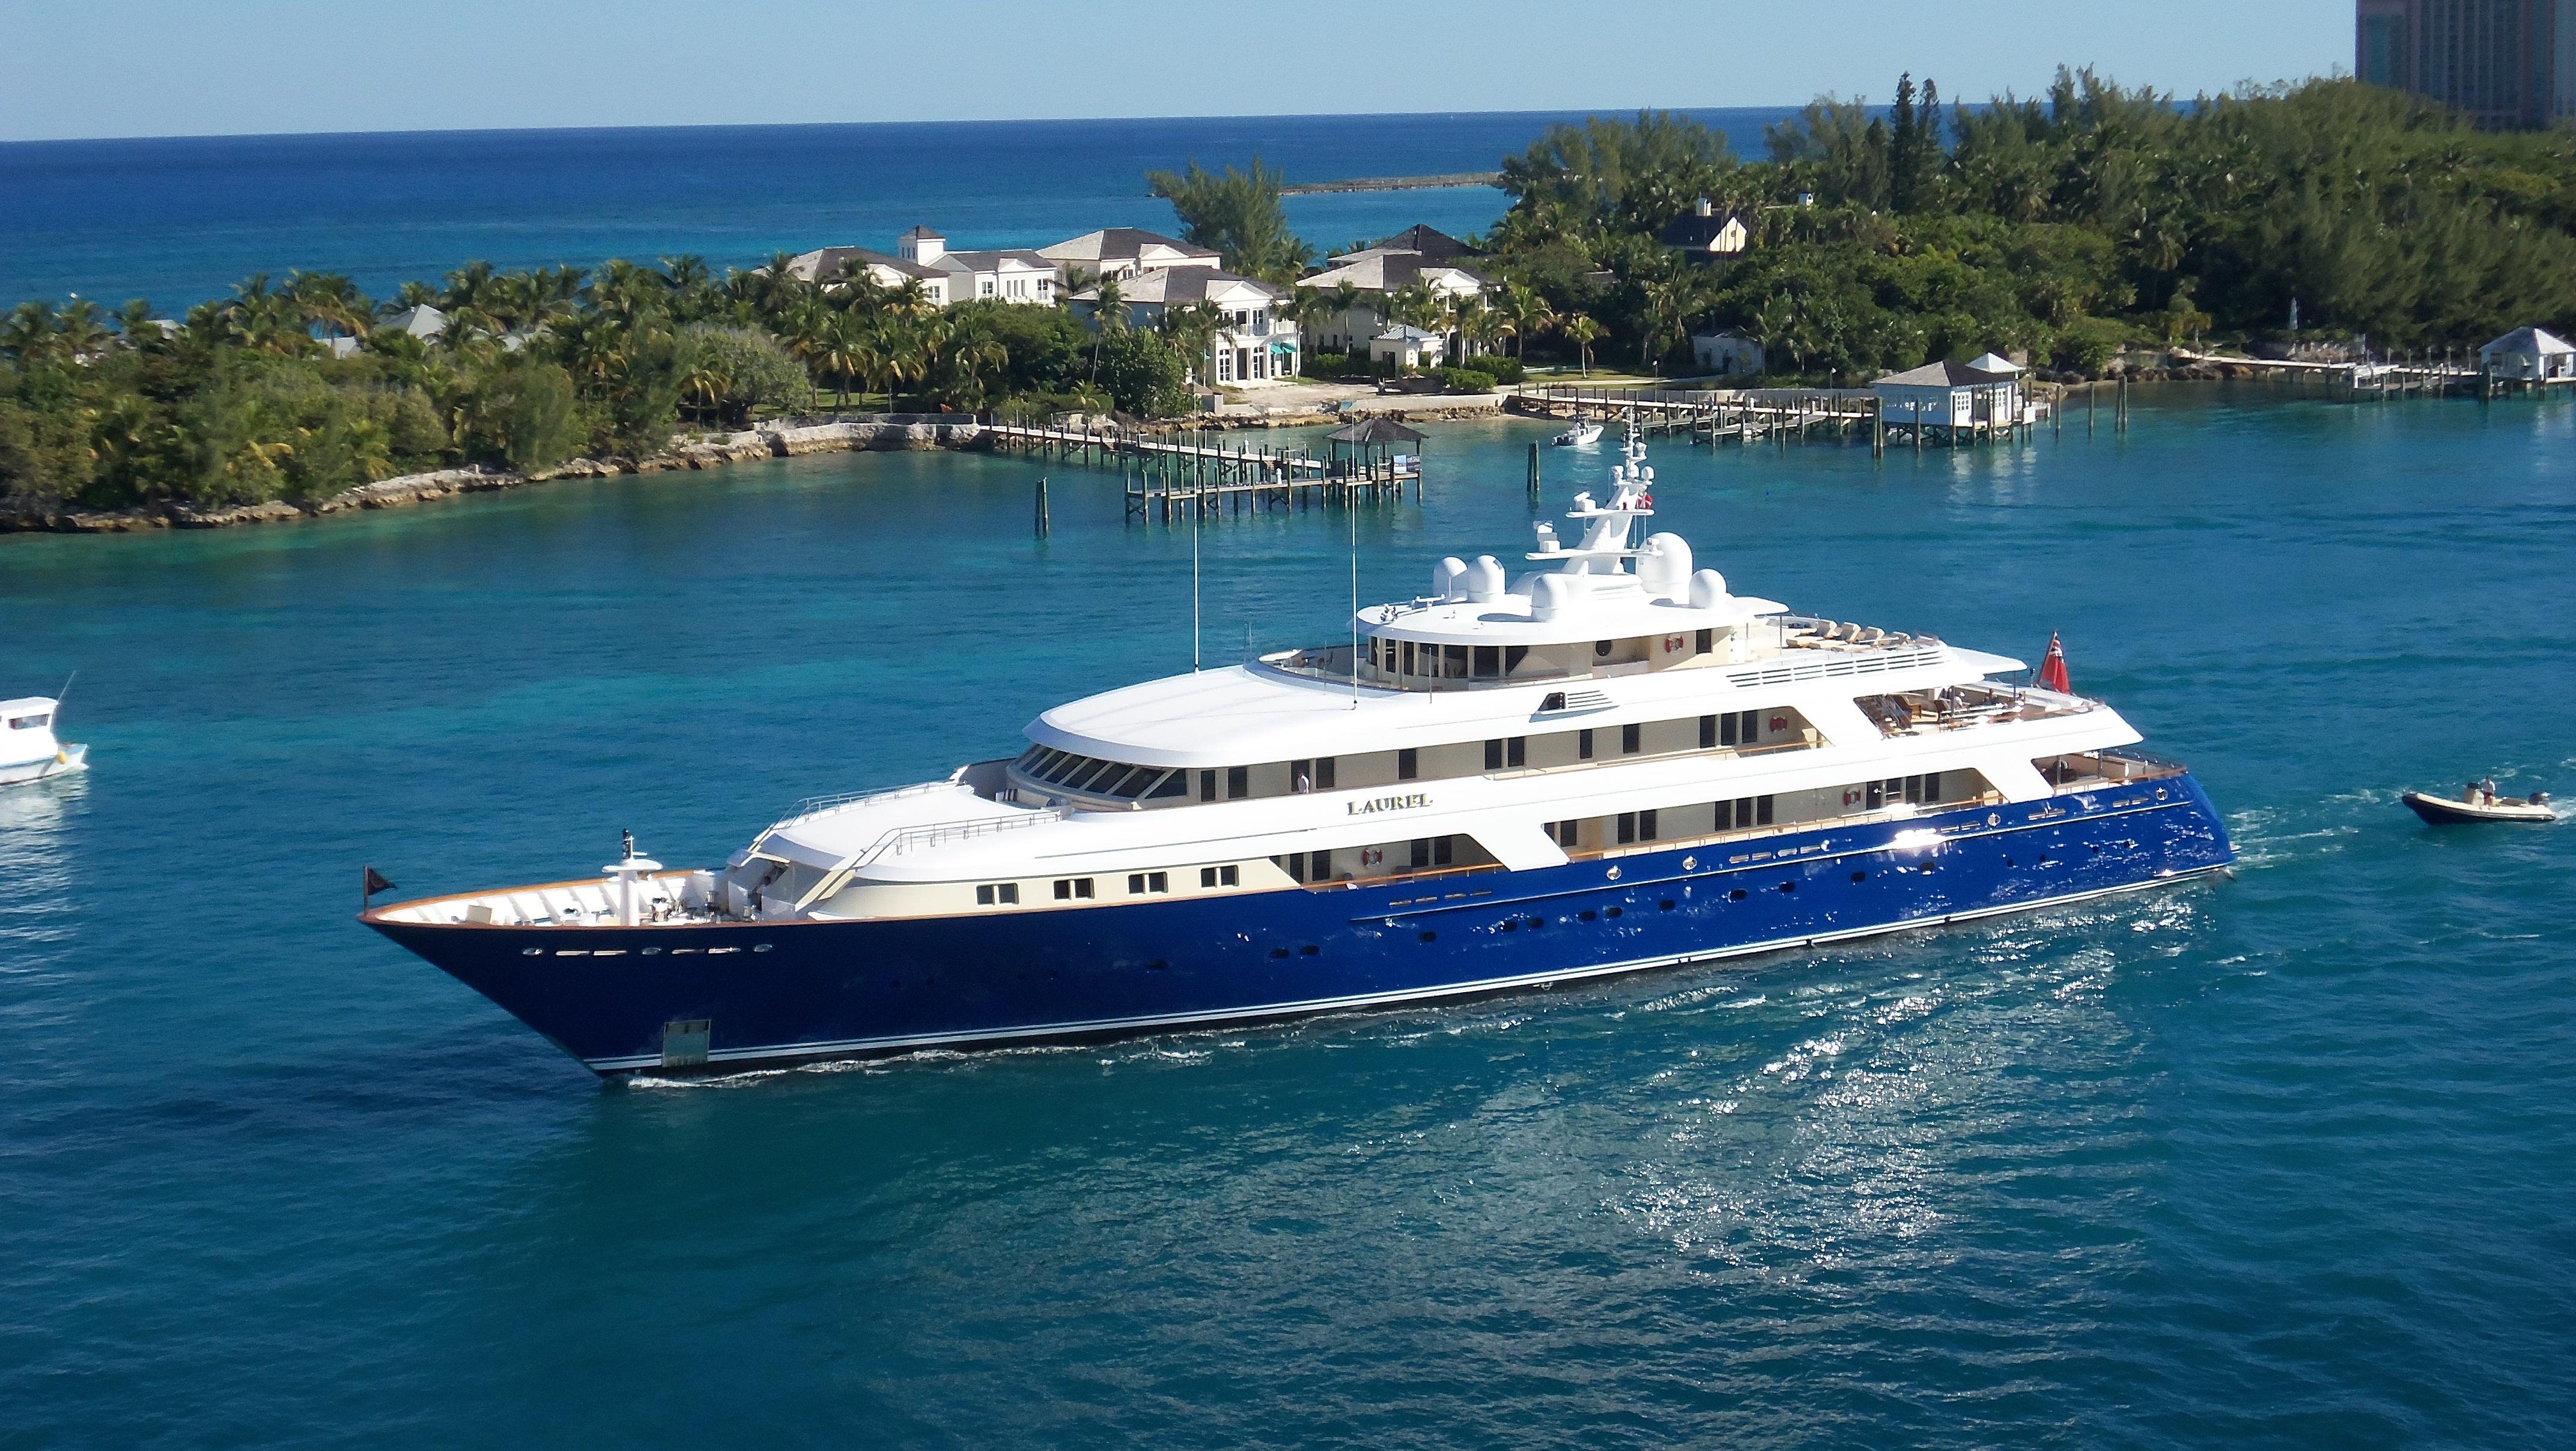 yacht-740610